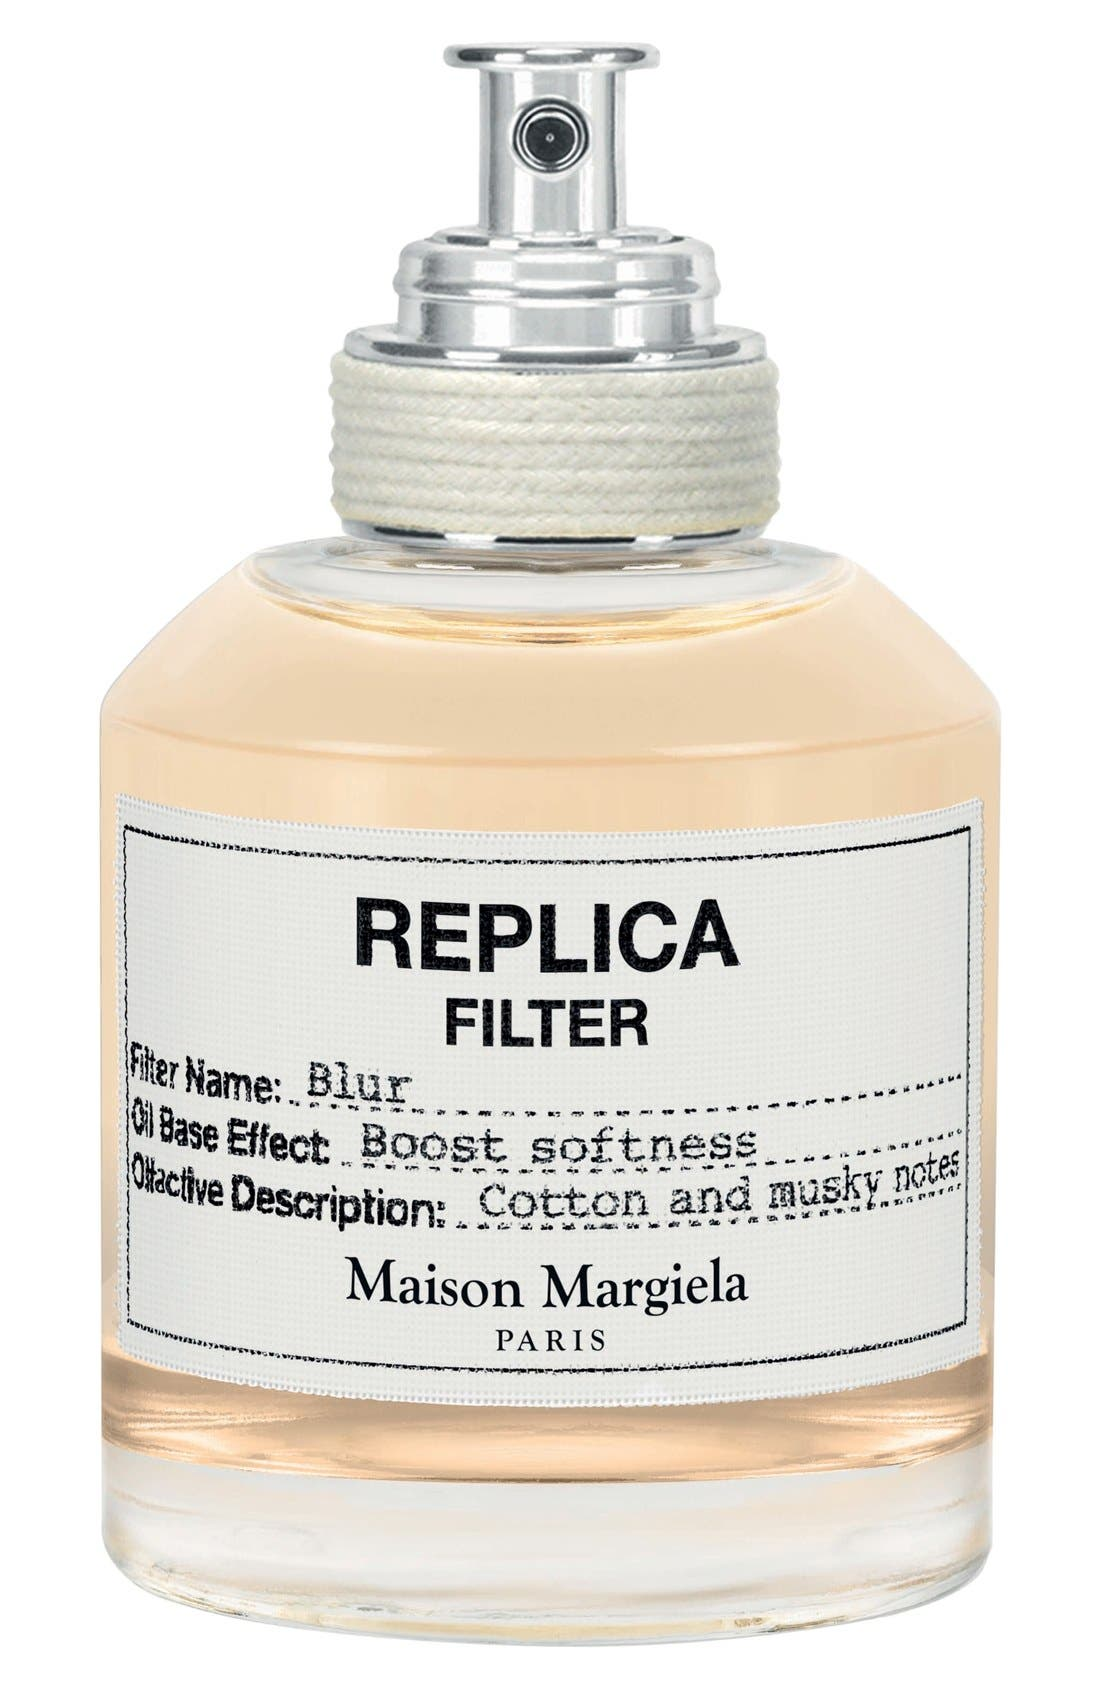 Maison Margiela Replica Filter Blur Fragrance Primer